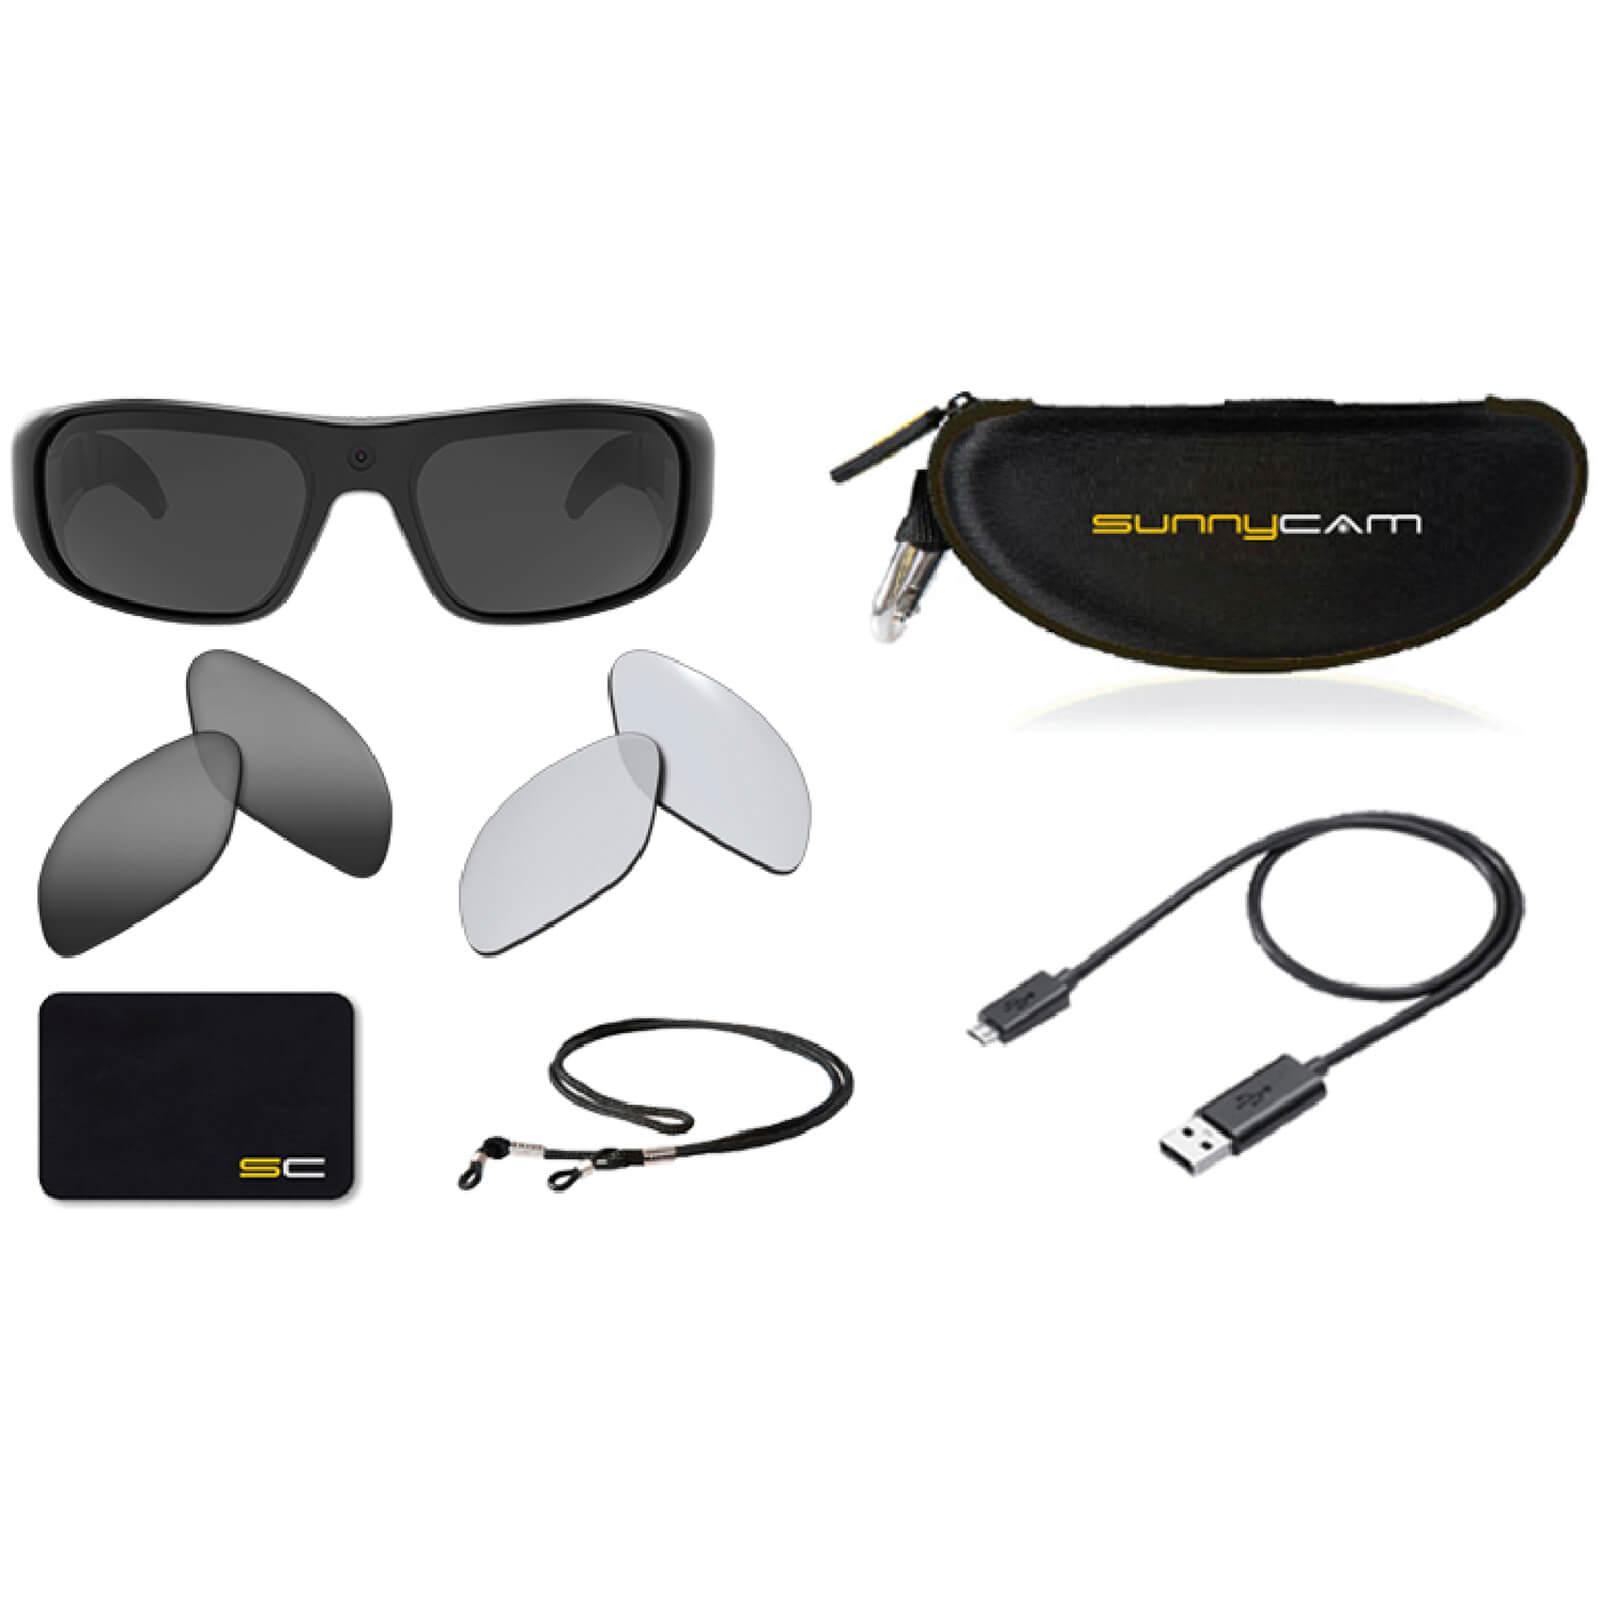 SunnyCam Xtreme HD Video Recording Glasses   ProBikeKit Canada d14a3378b2ba